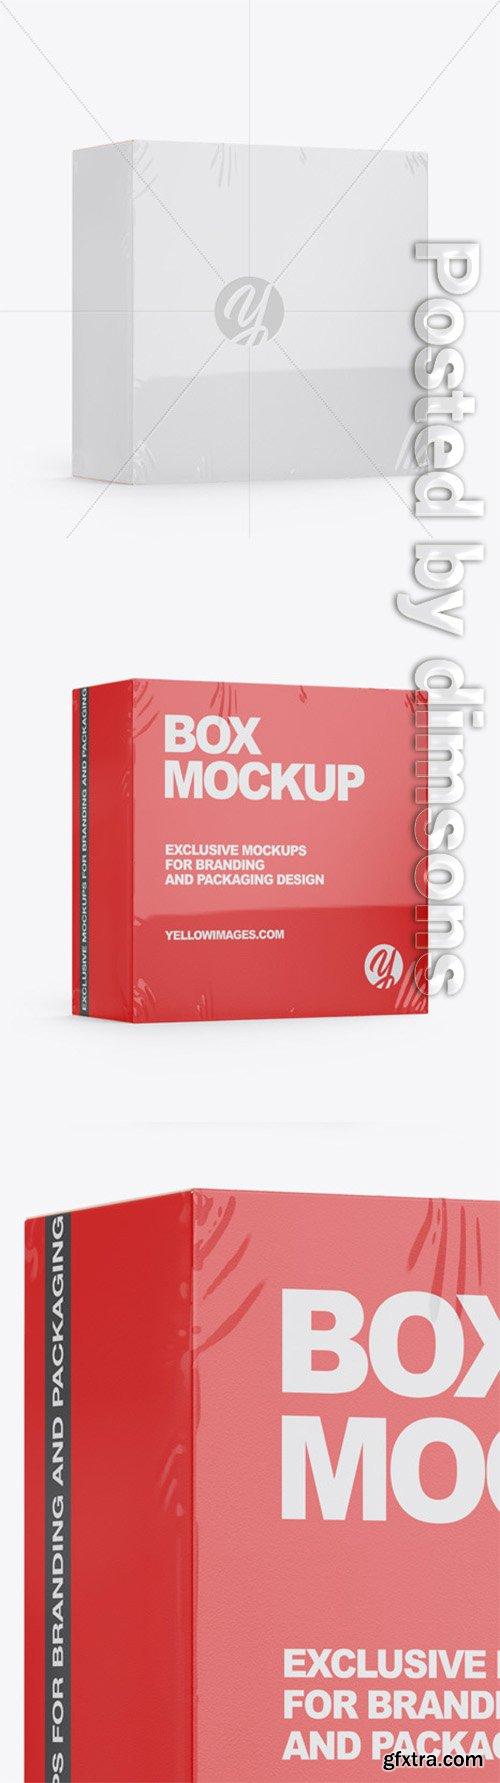 Download Mockup Design Studio Yellowimages